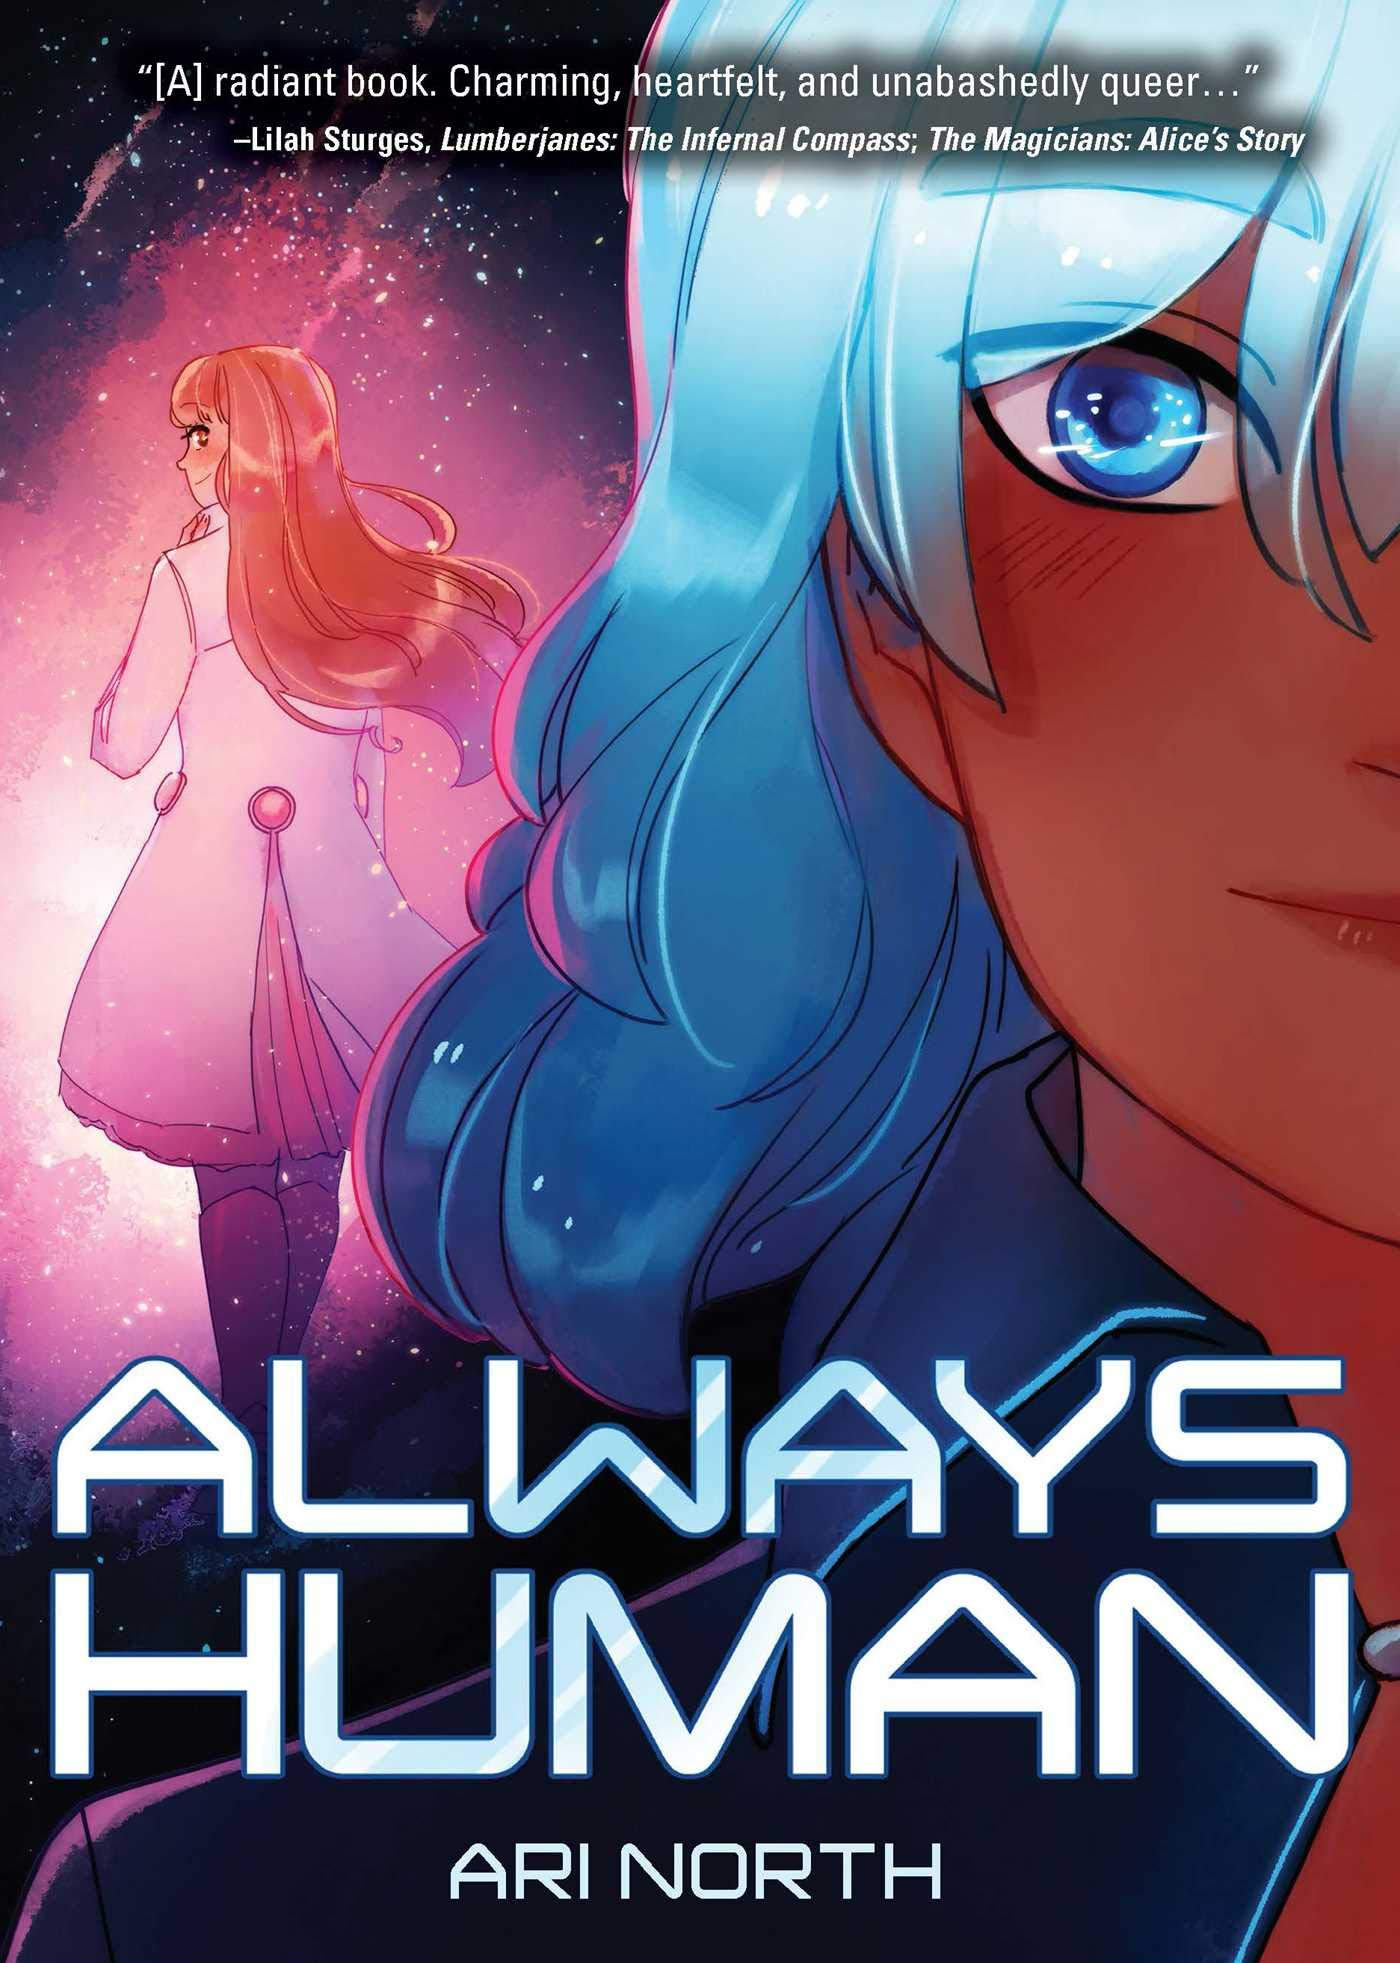 Always Human | Amazon.com.br